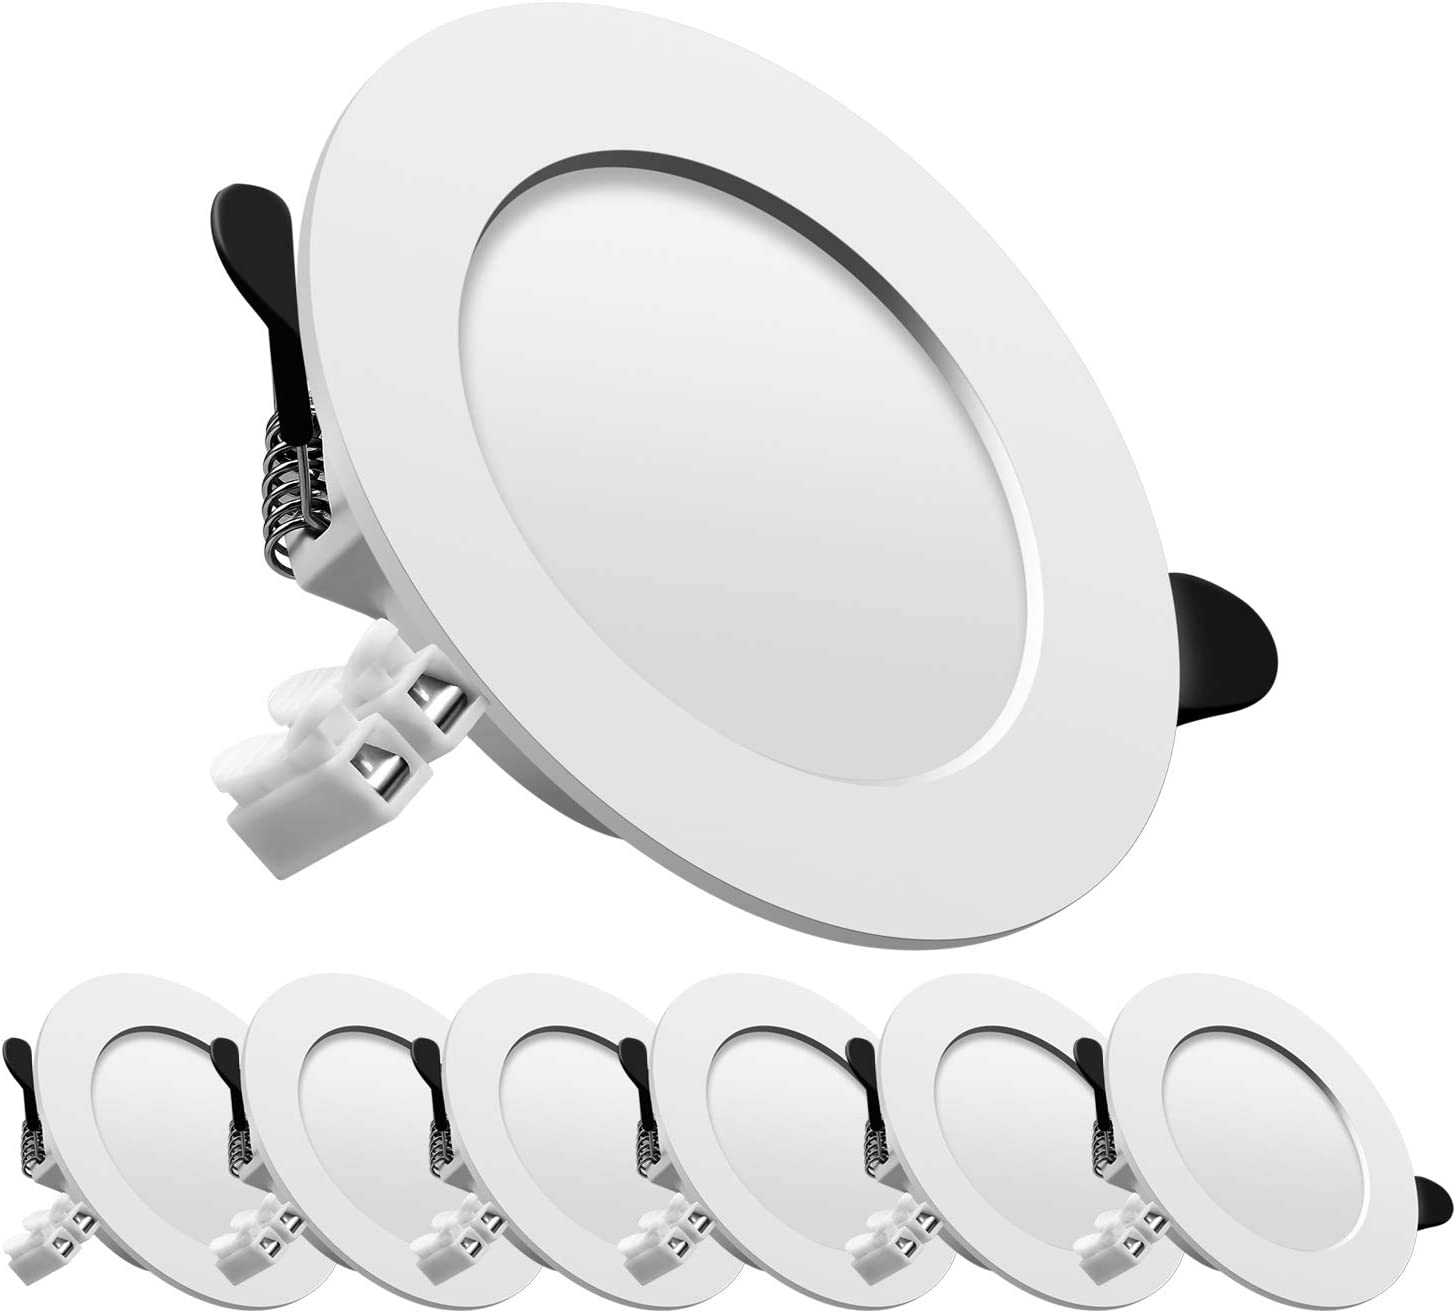 Downlight led empotrable redondo,Iluminacion 7W (700 lm),2700K (Luz Cálida), Blanco,foco empotrable LED,Ojos de buey de led 6 pack